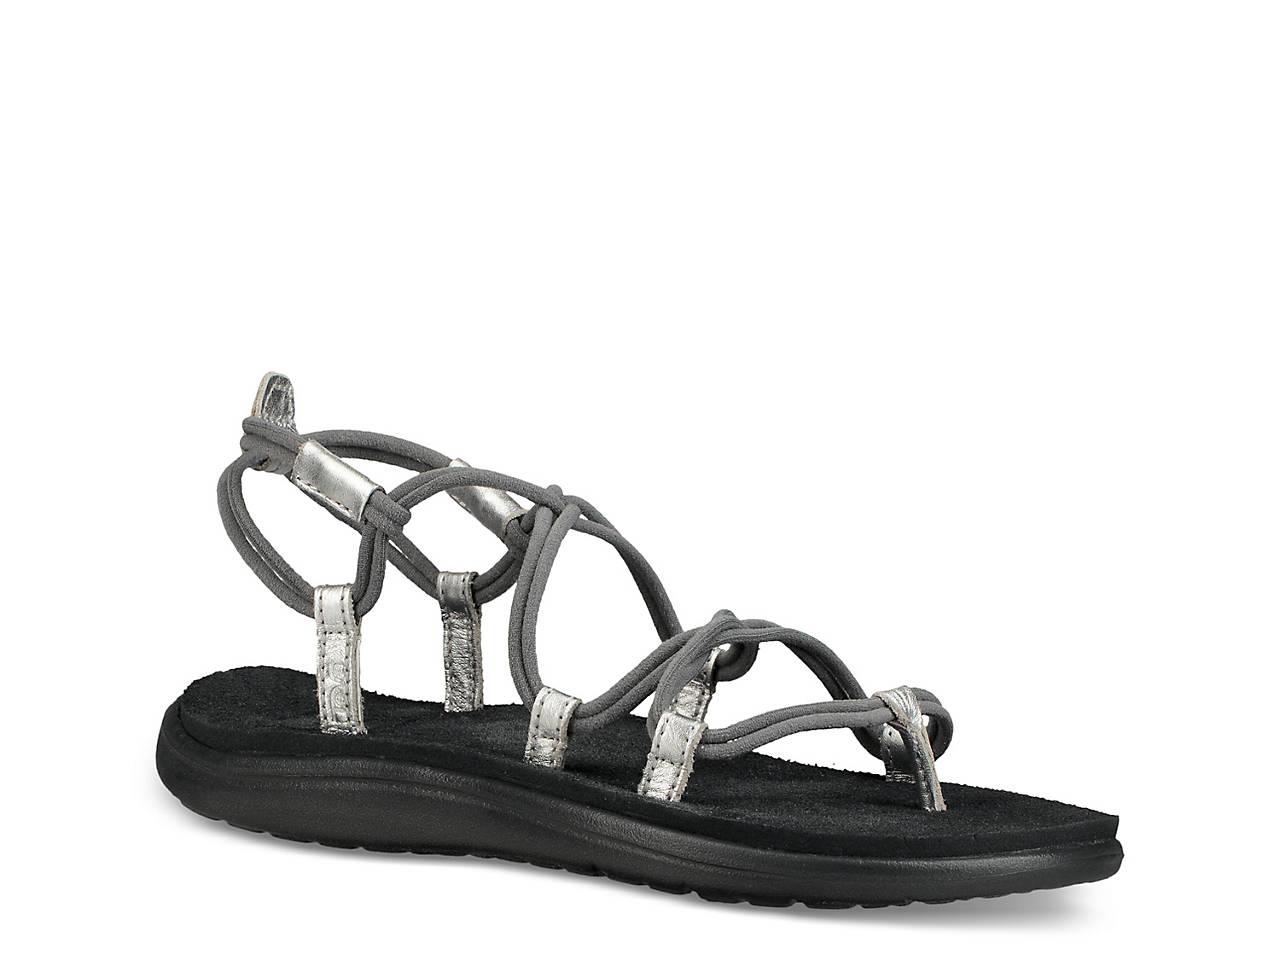 28198453072a Teva Voya Infinity Sandal Women s Shoes